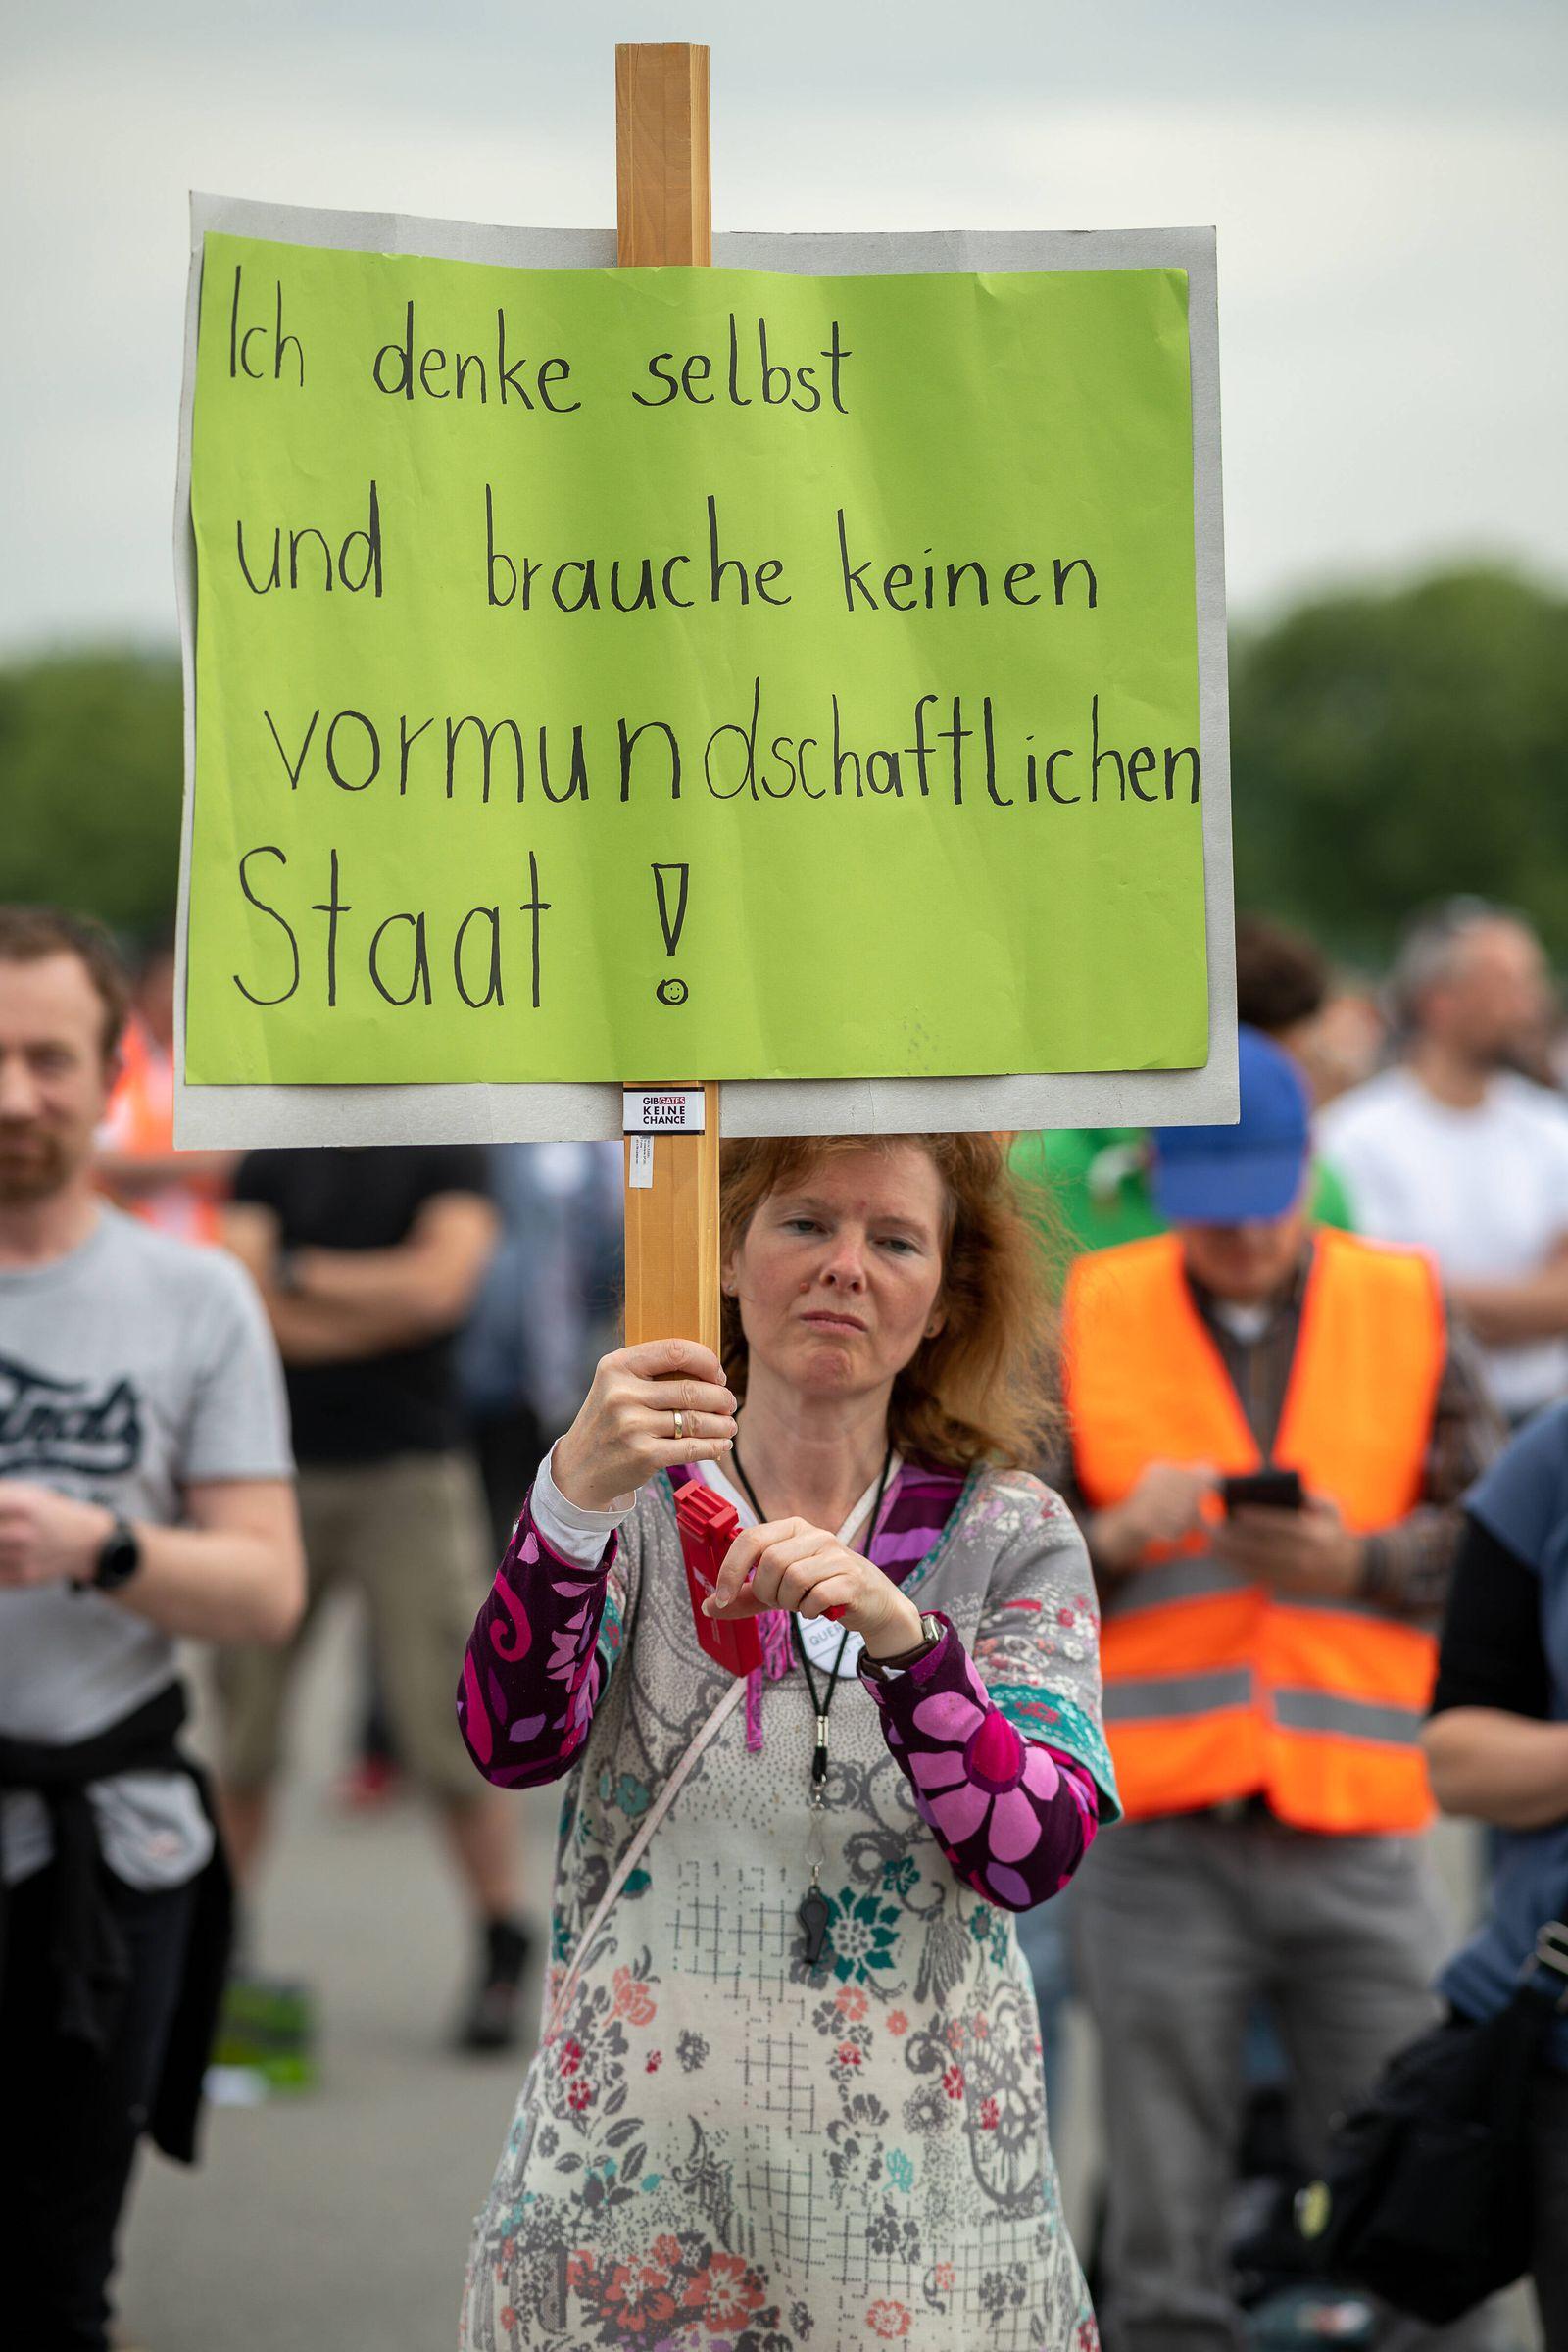 Stuttgart Querdenken, DEMO, Grundrechte DEMO, Corona-Demonstrationen, Corona-Virus, Grundrechte, 09.05.2020 ich denke se